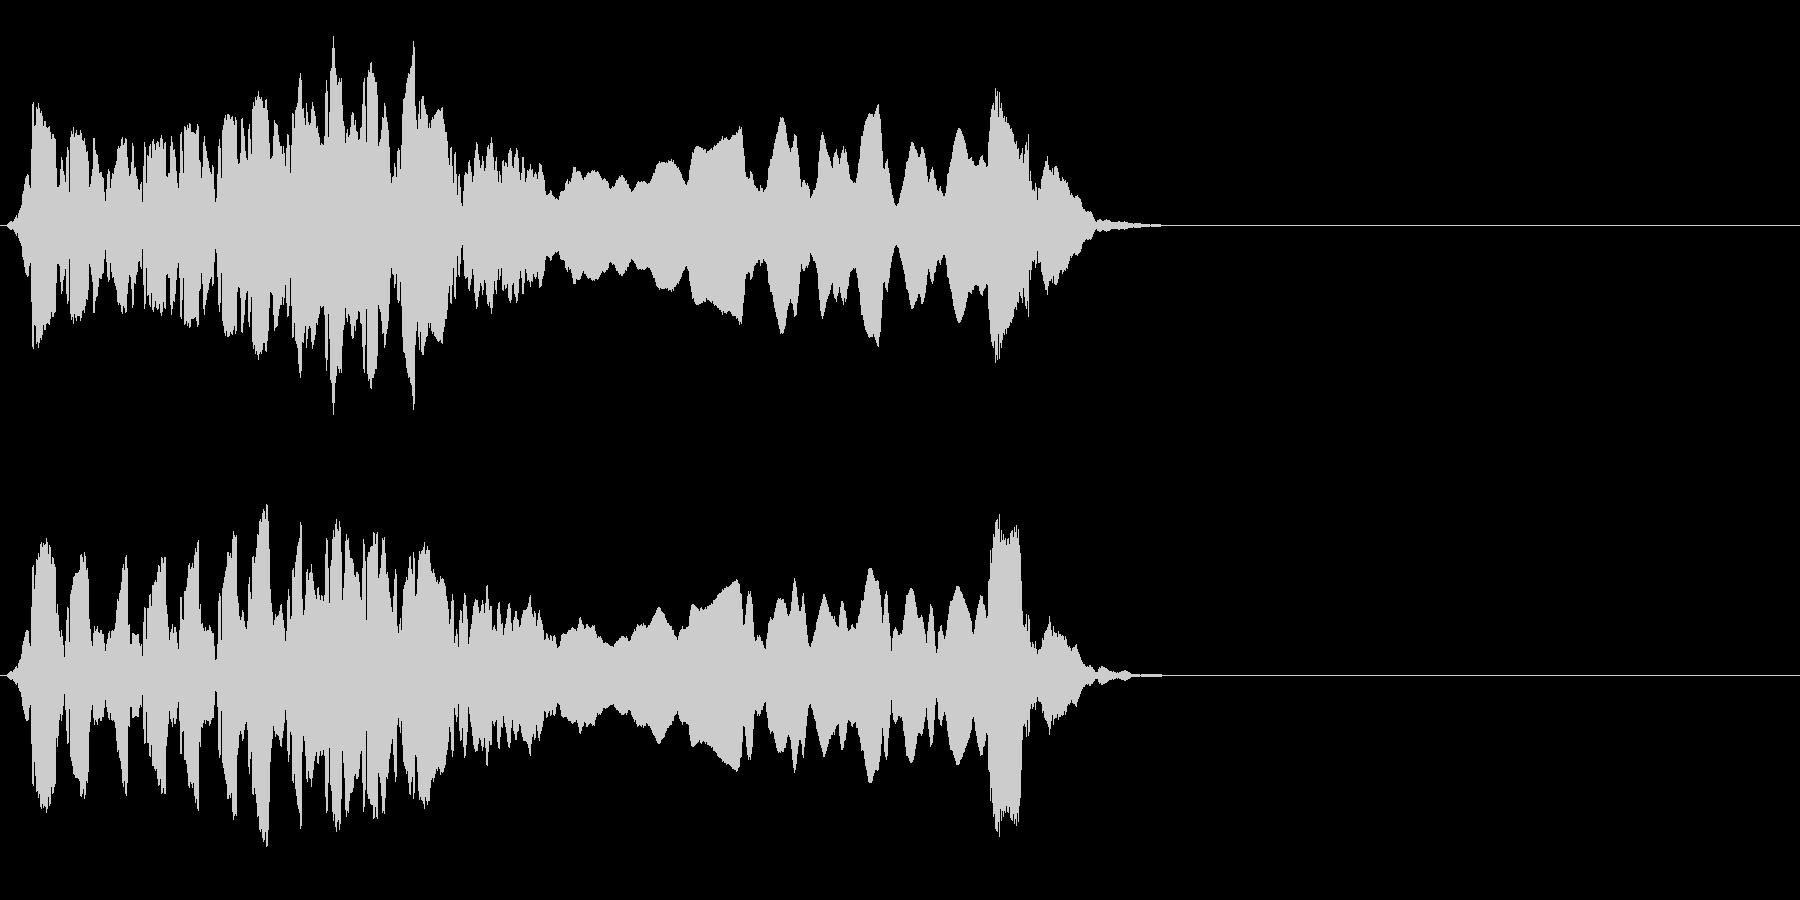 尺八 生演奏 古典風#10の未再生の波形